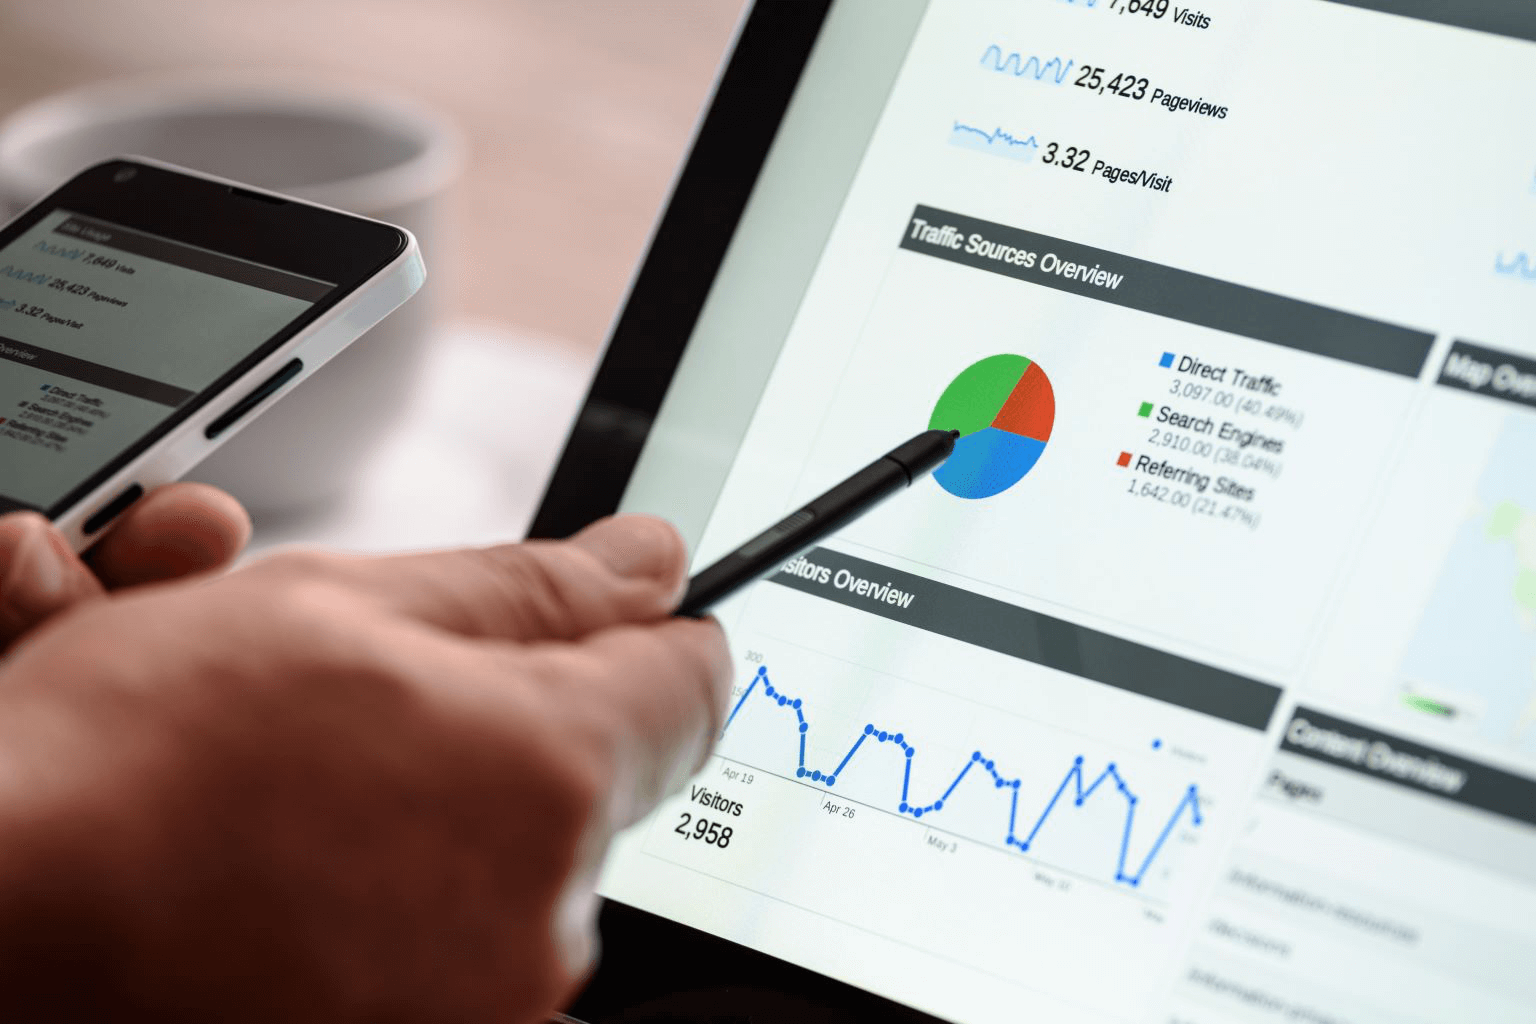 Case datagedreven marketing   PDCA cyclus   PDCA principe